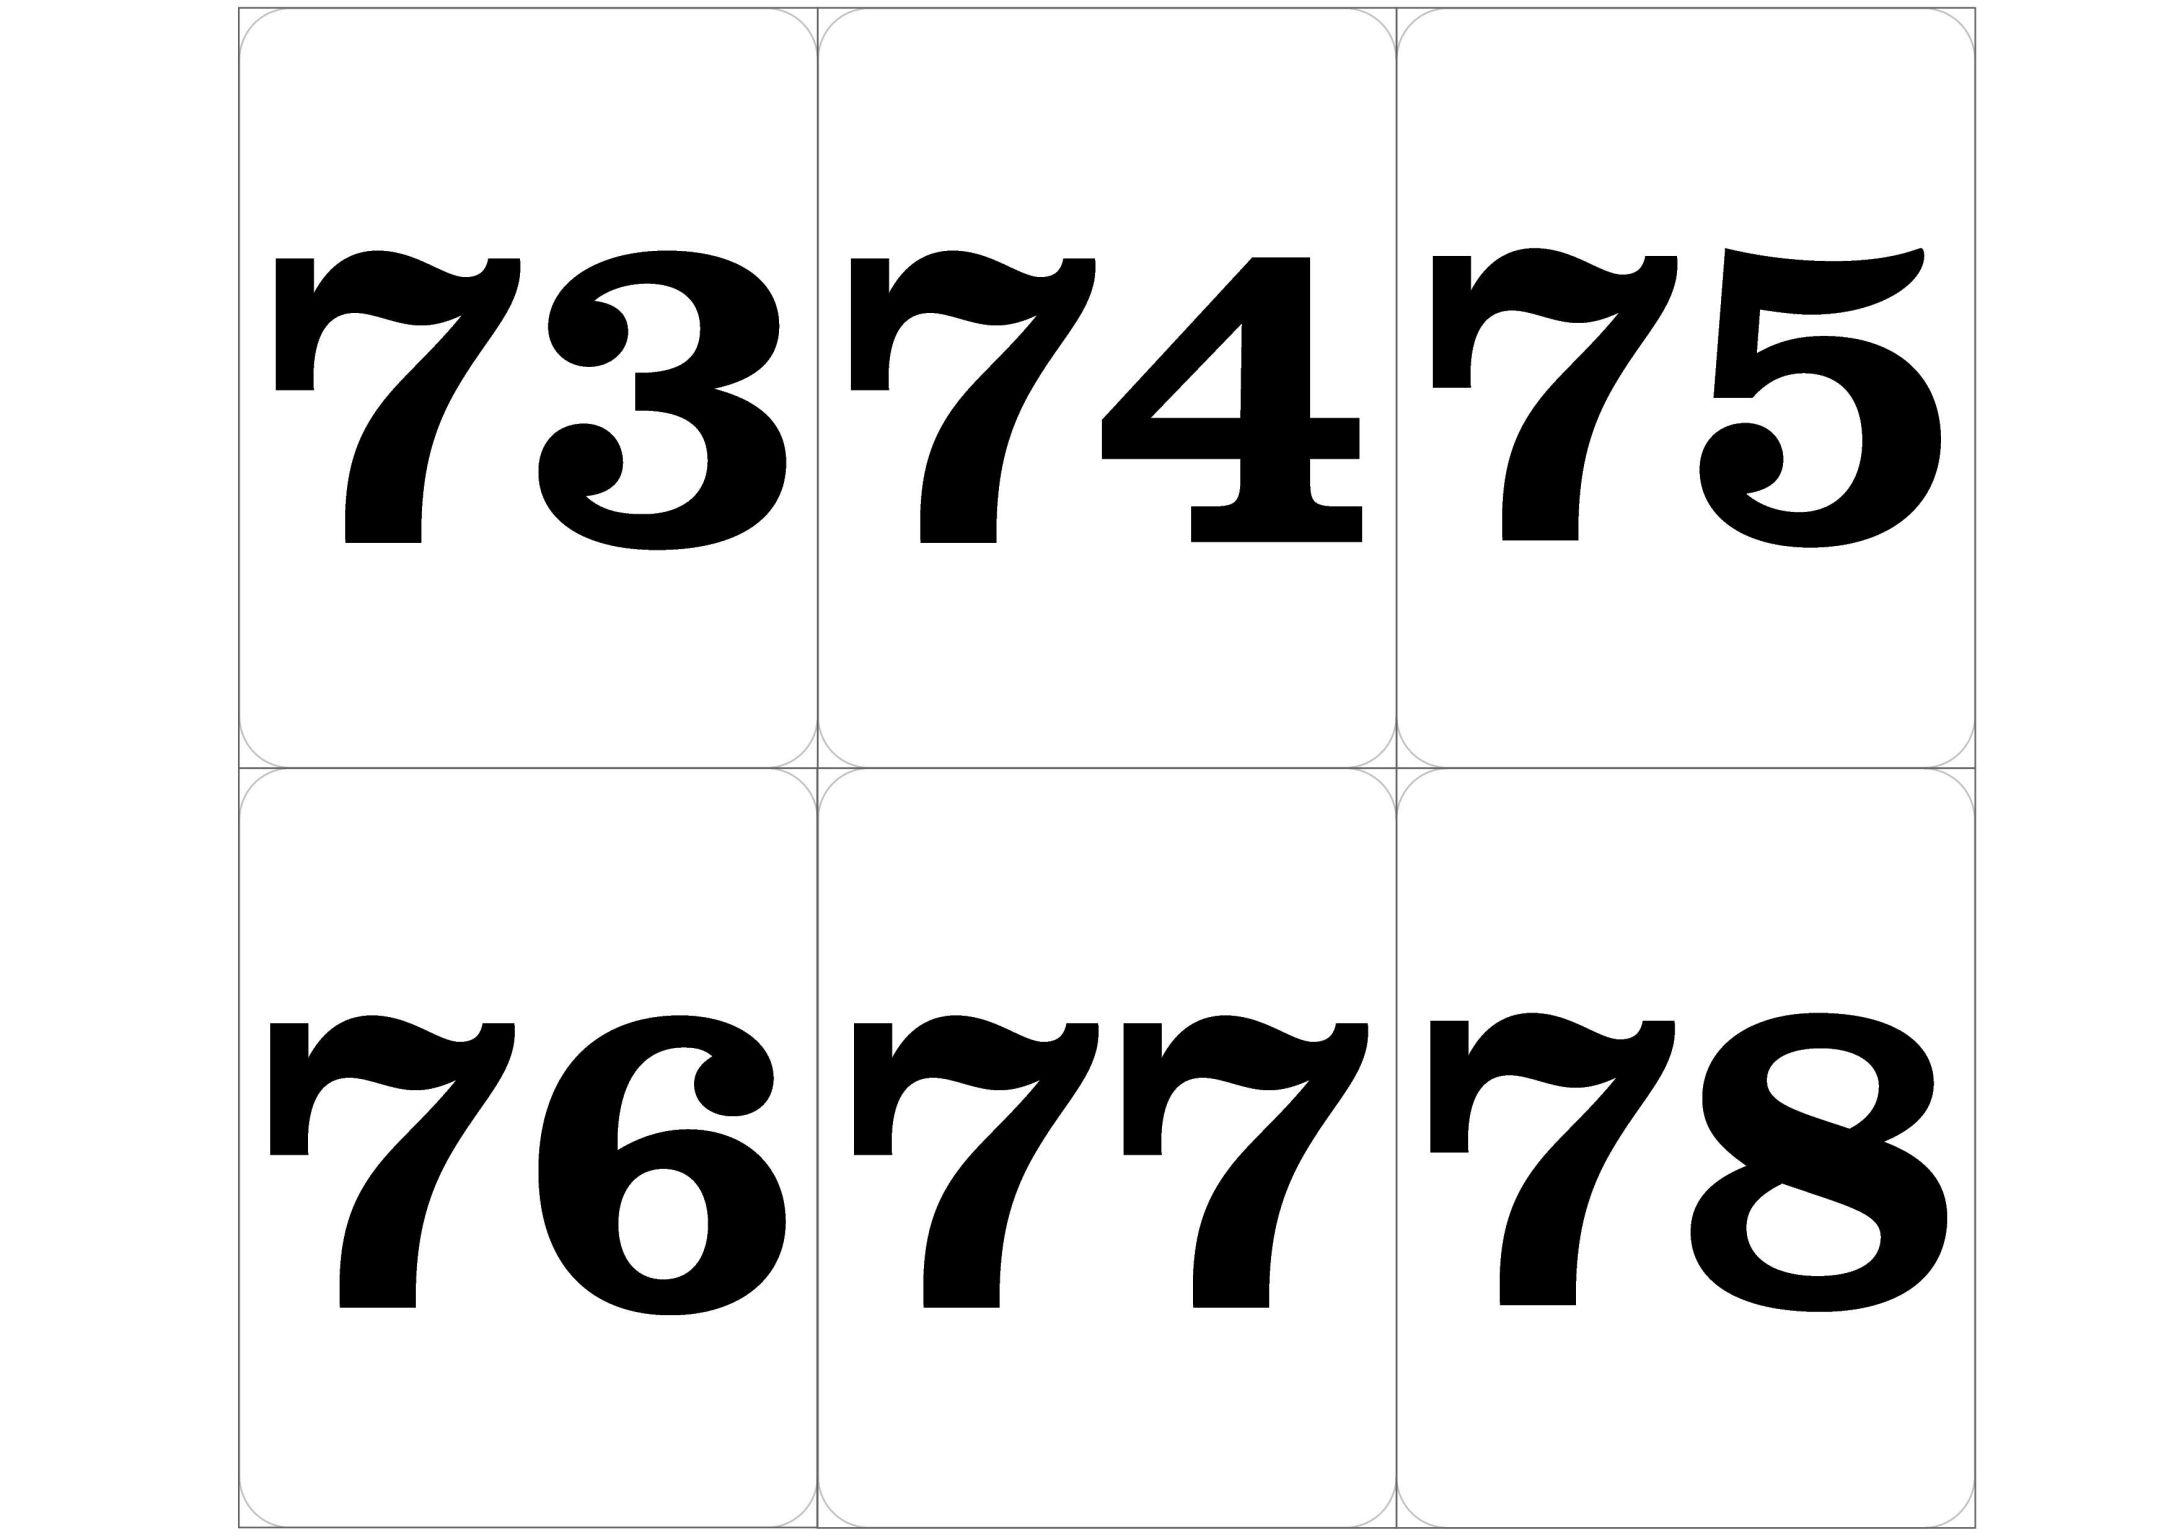 Знаки картинки для печати карточки черно белые